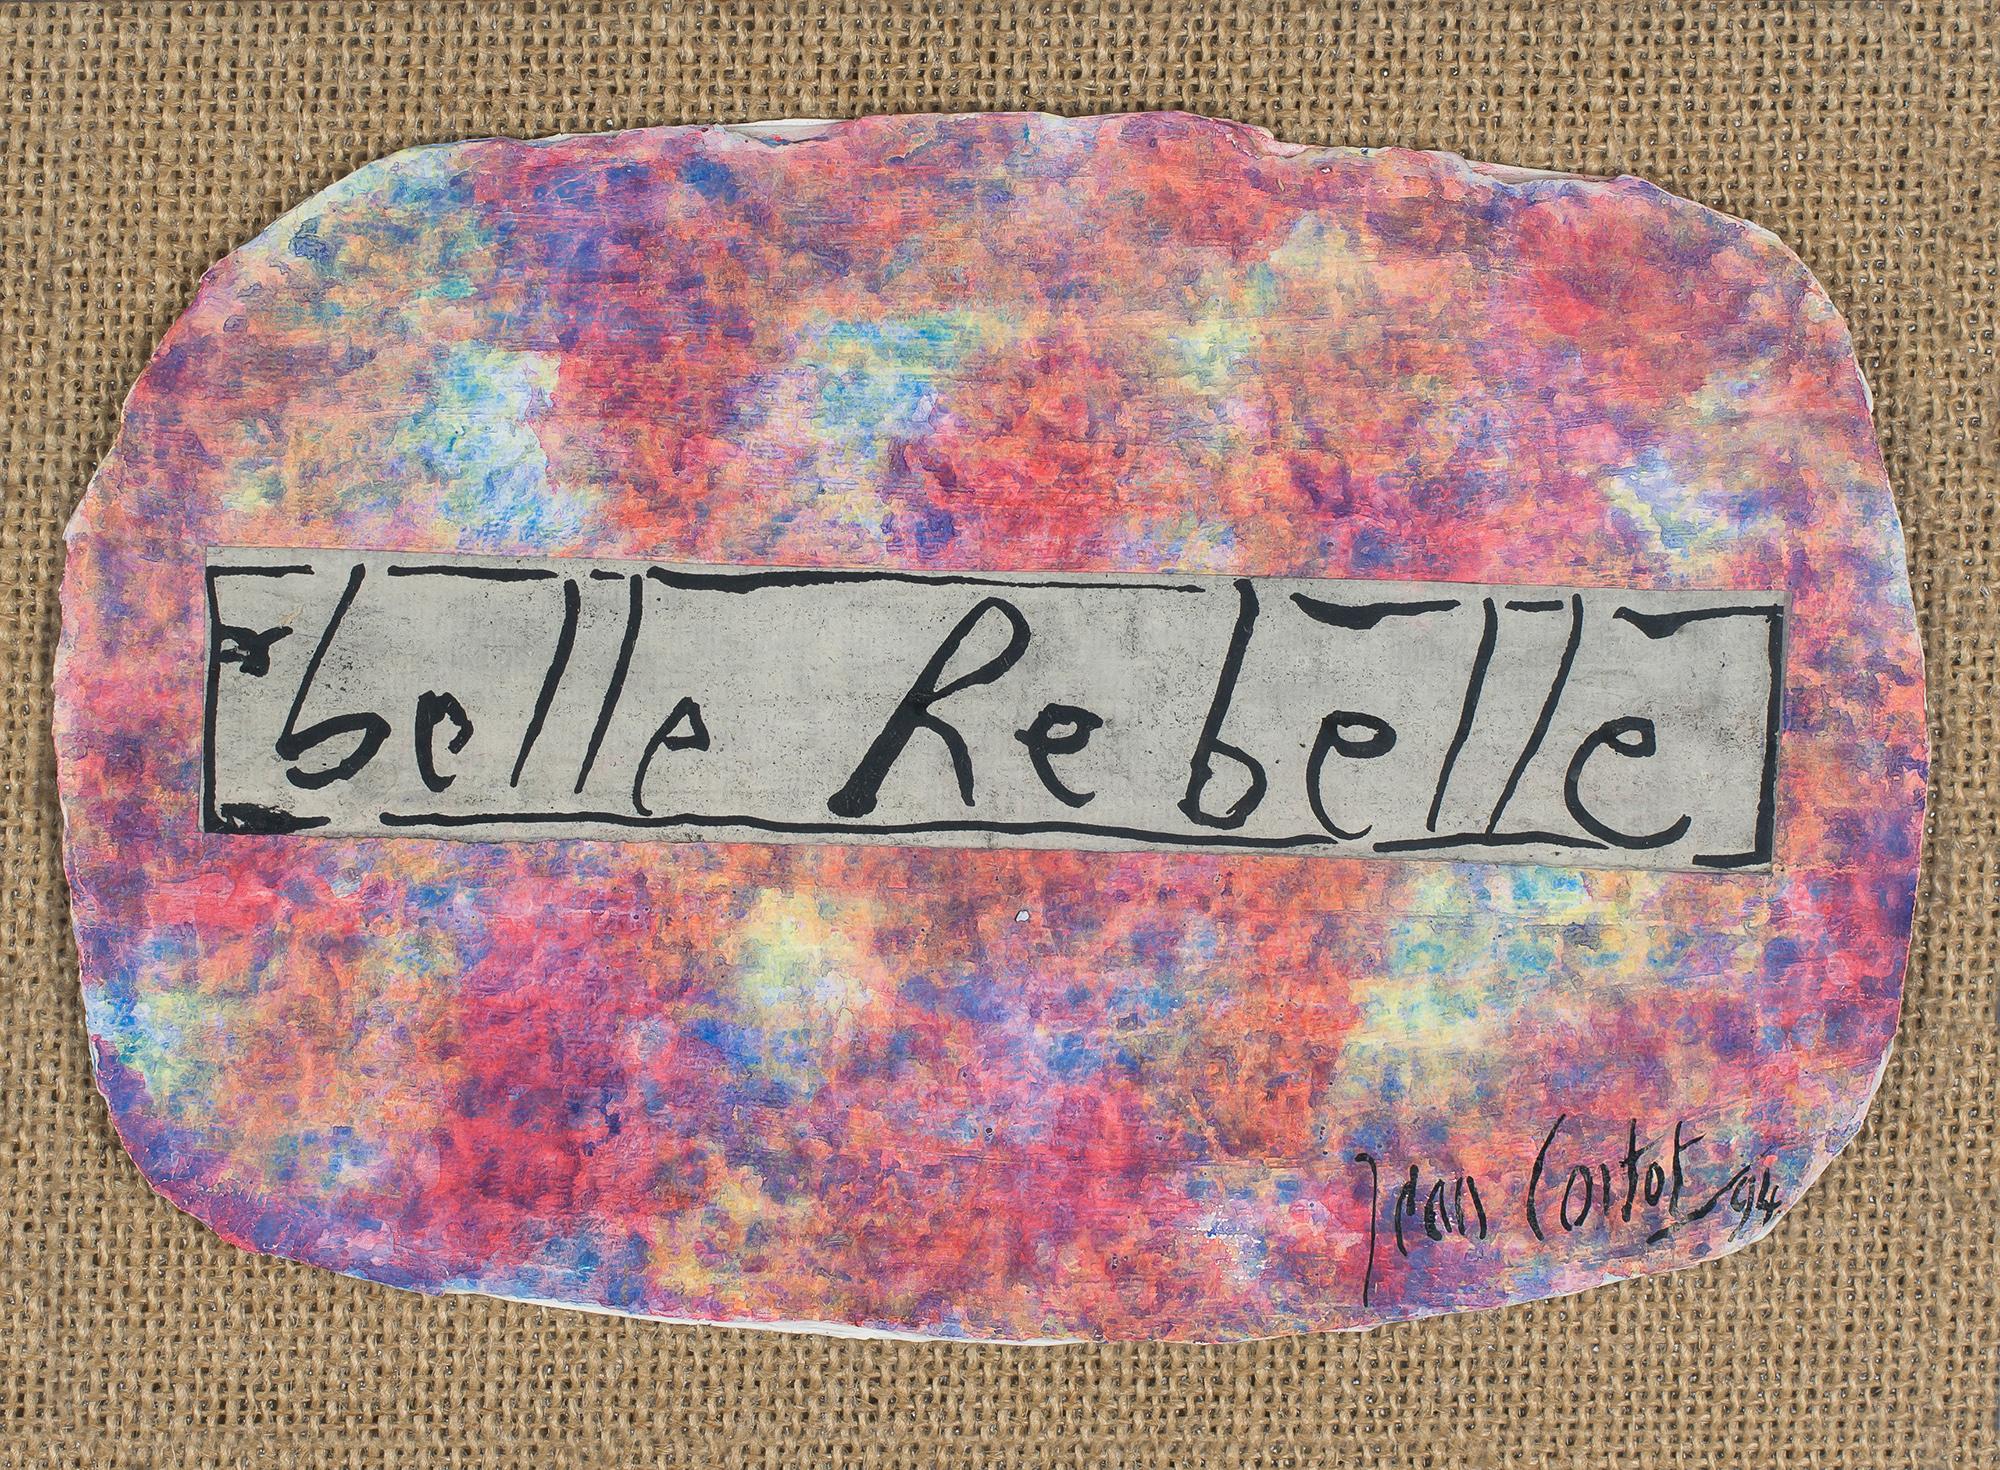 jean cortot - collage cardboard belle rebelle 1994